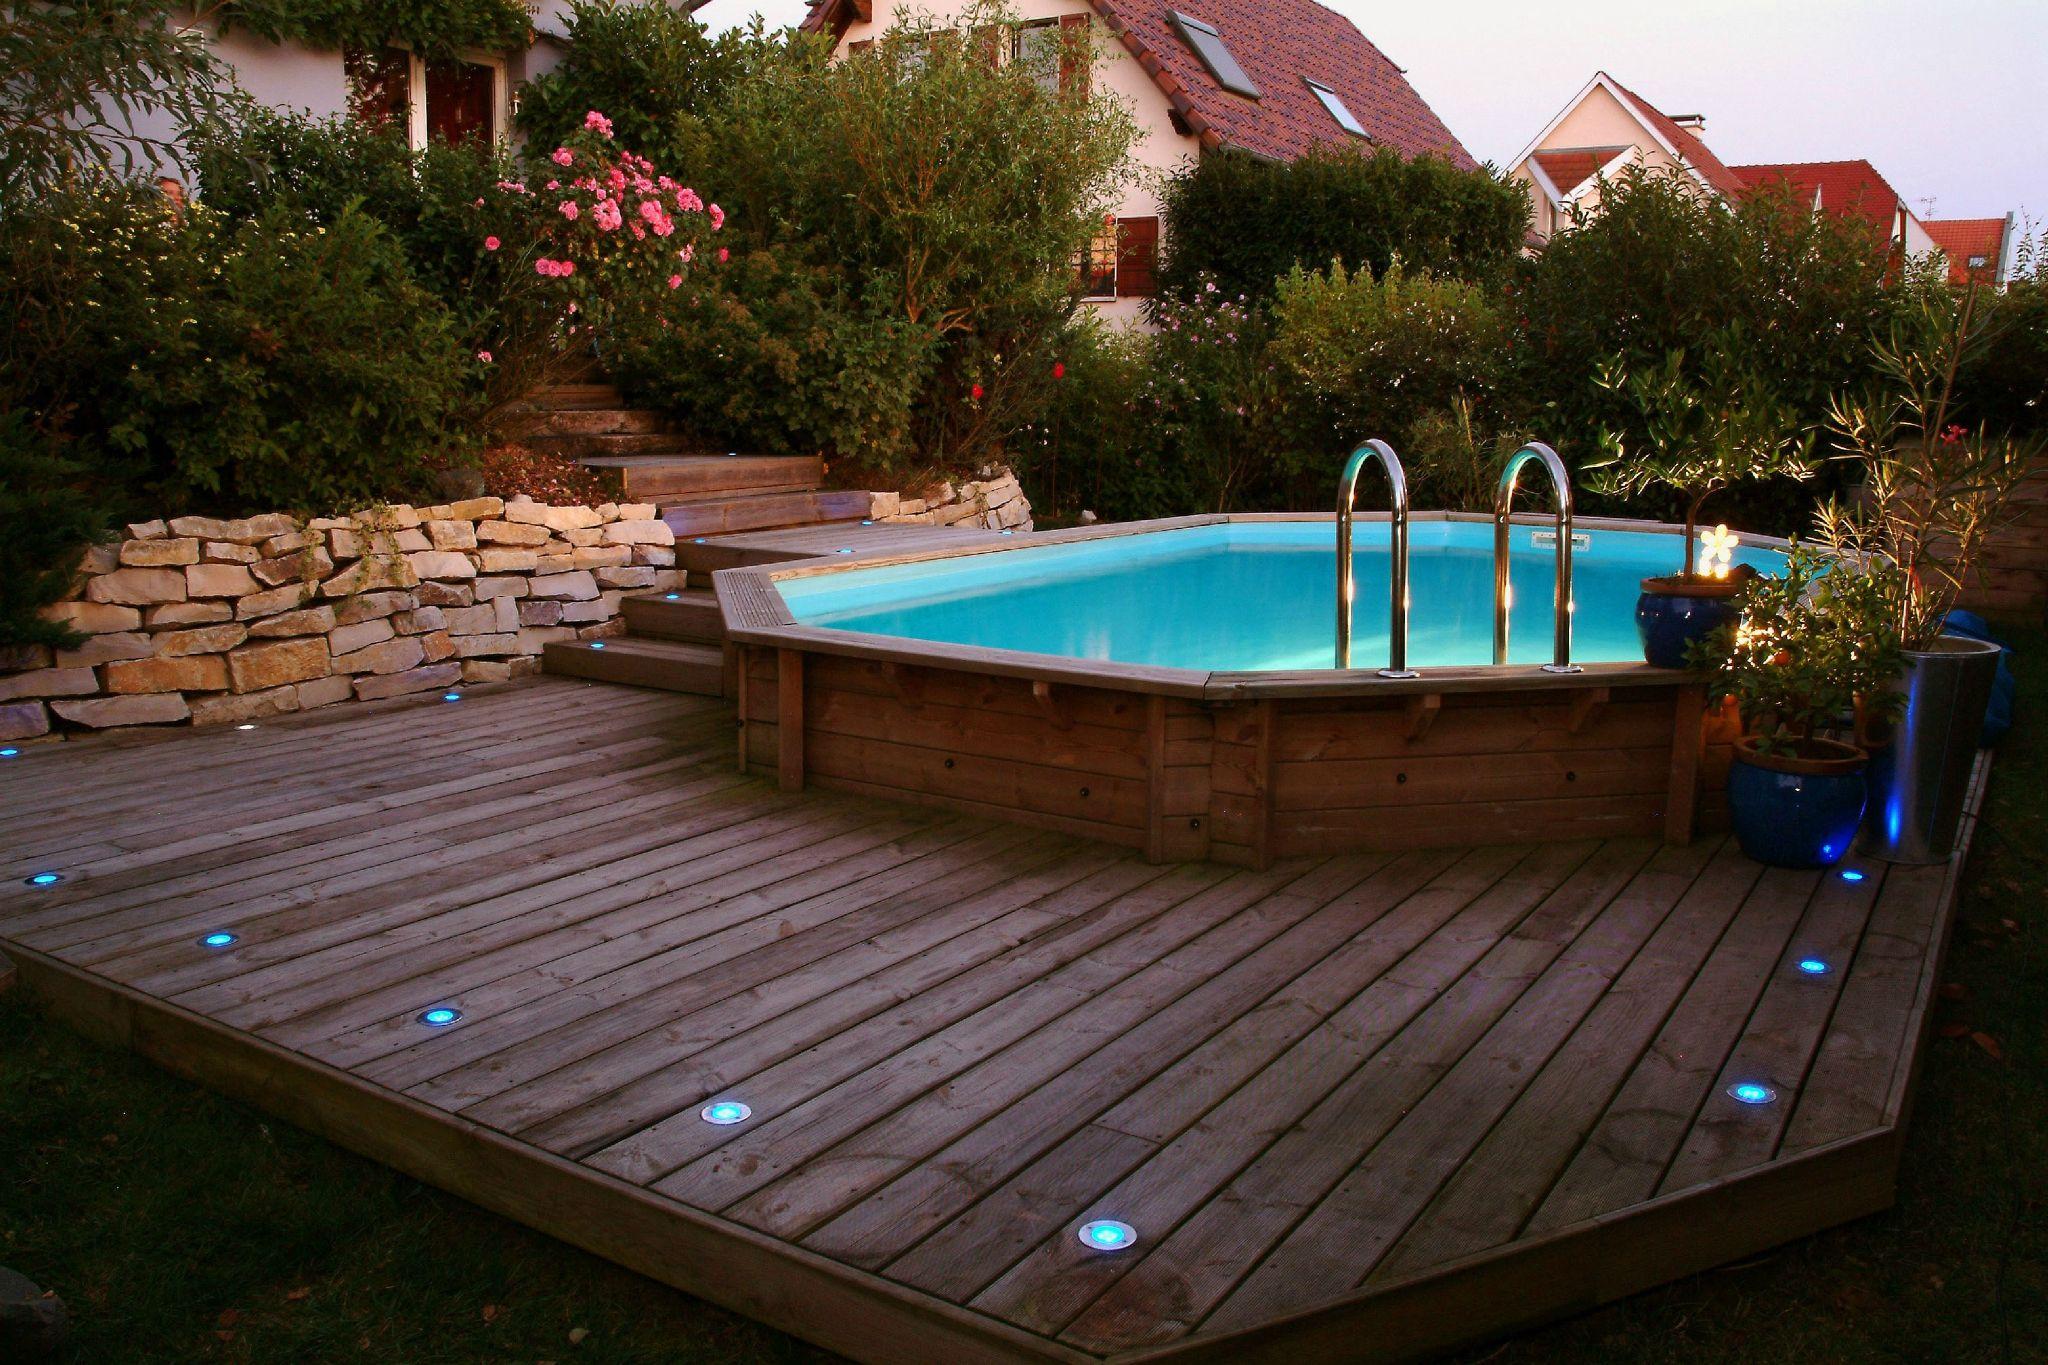 piscine hors sol ovale en bois piscine piscine semi creus e piscine hors sol et piscine bois. Black Bedroom Furniture Sets. Home Design Ideas